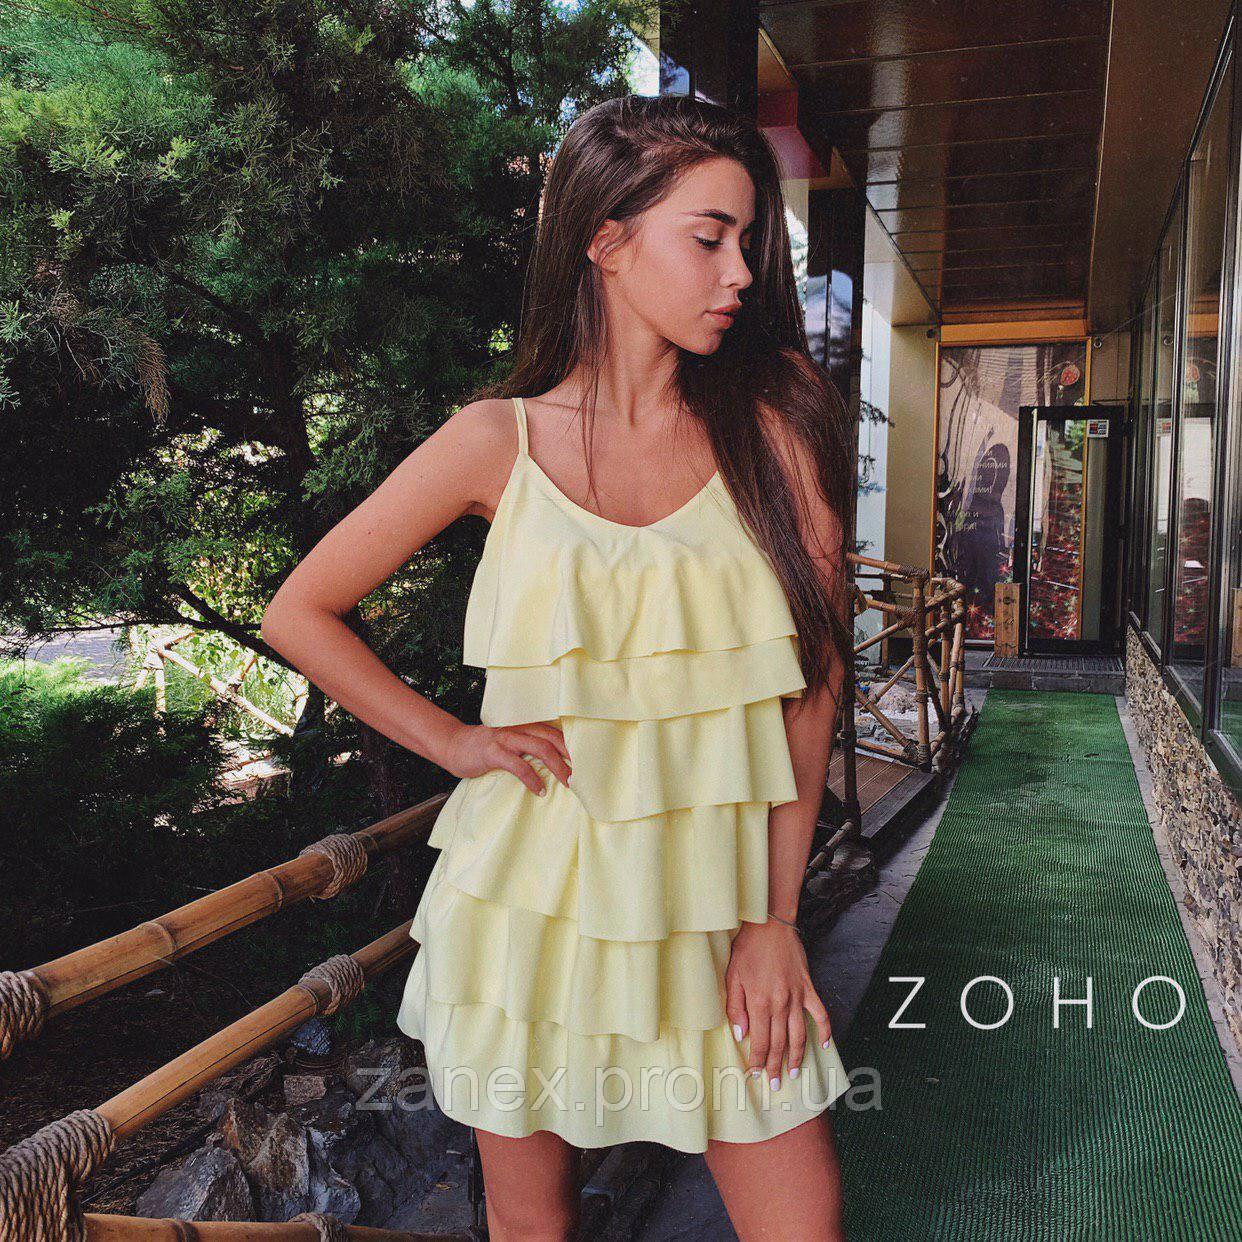 Платье Zanex «Елка», желтое